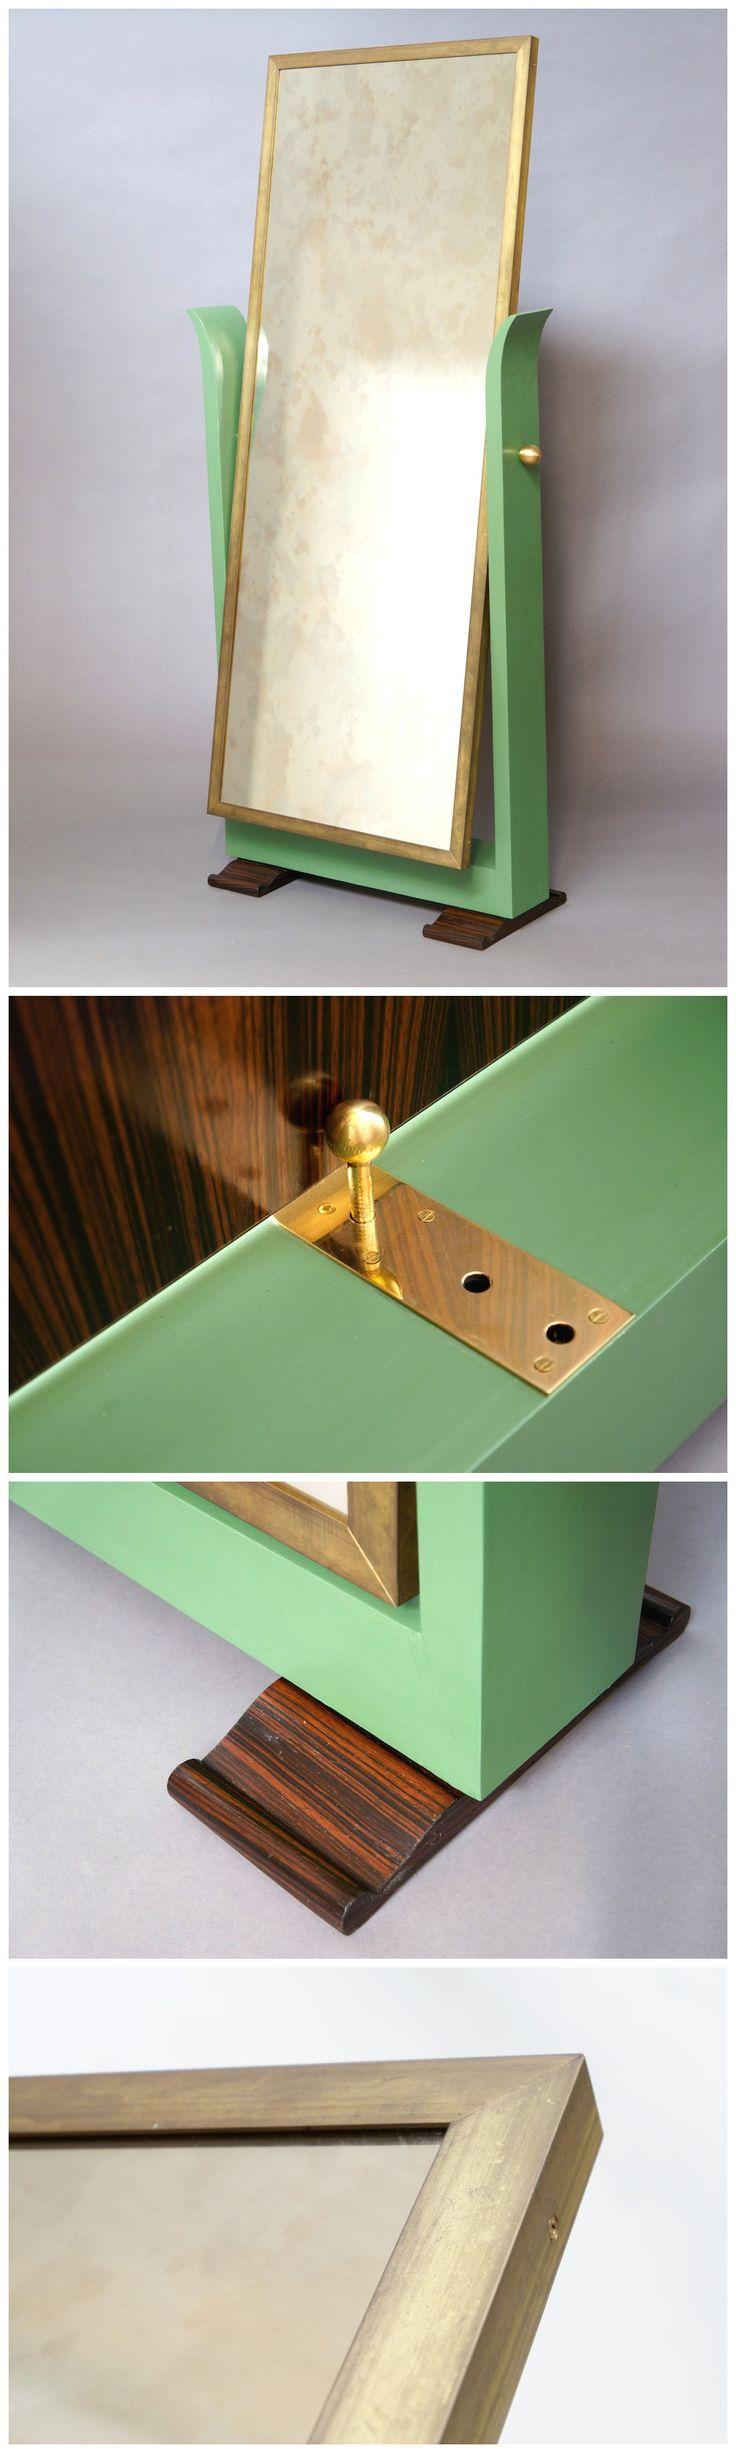 #Italian floor mirror, rosewood, brass & painted frame, #ArtDeco style.